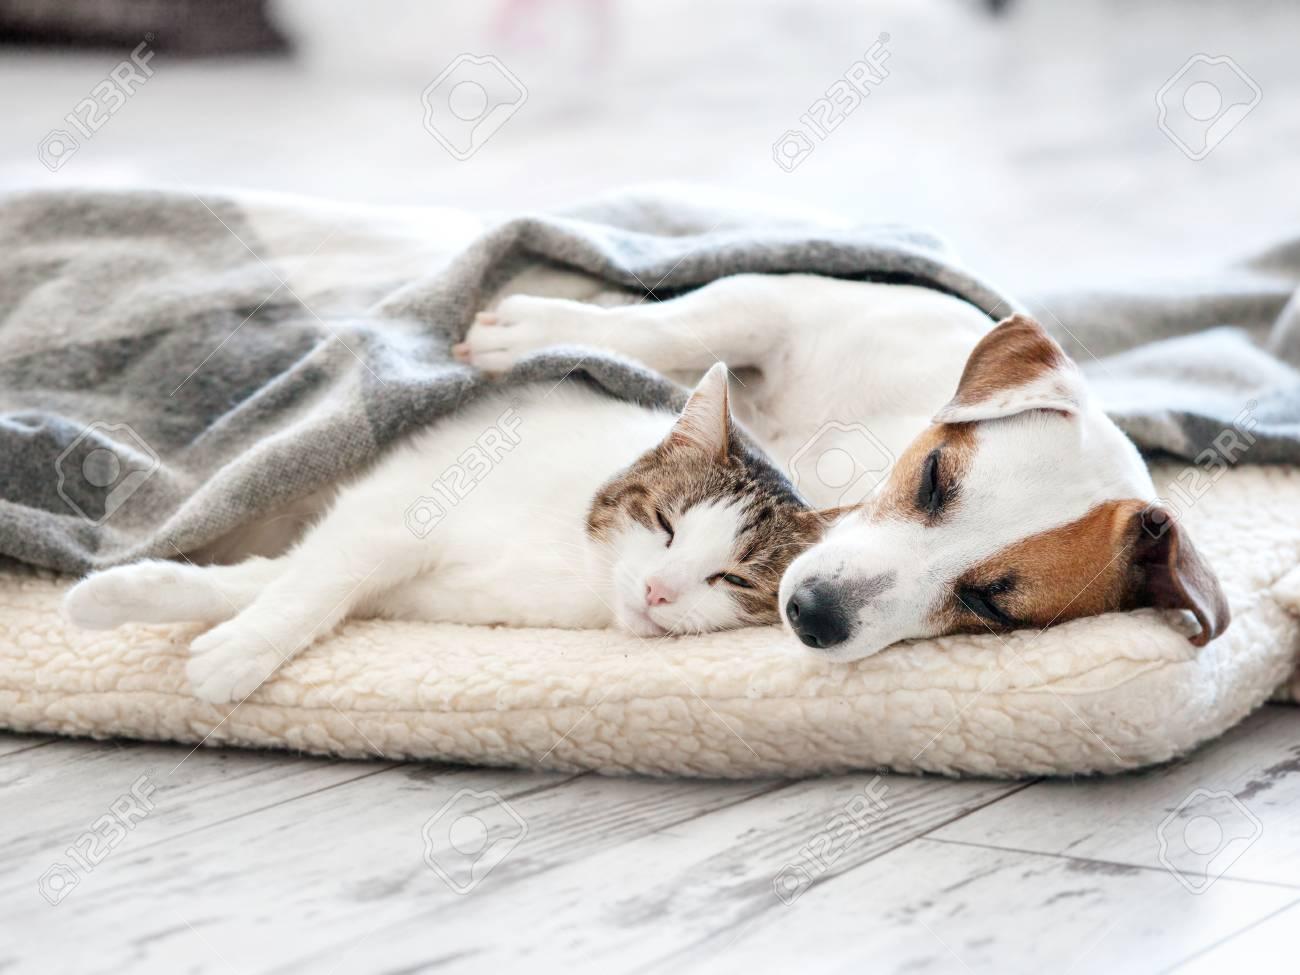 Cat and dog sleeping. Pets sleeping embracing - 101106854